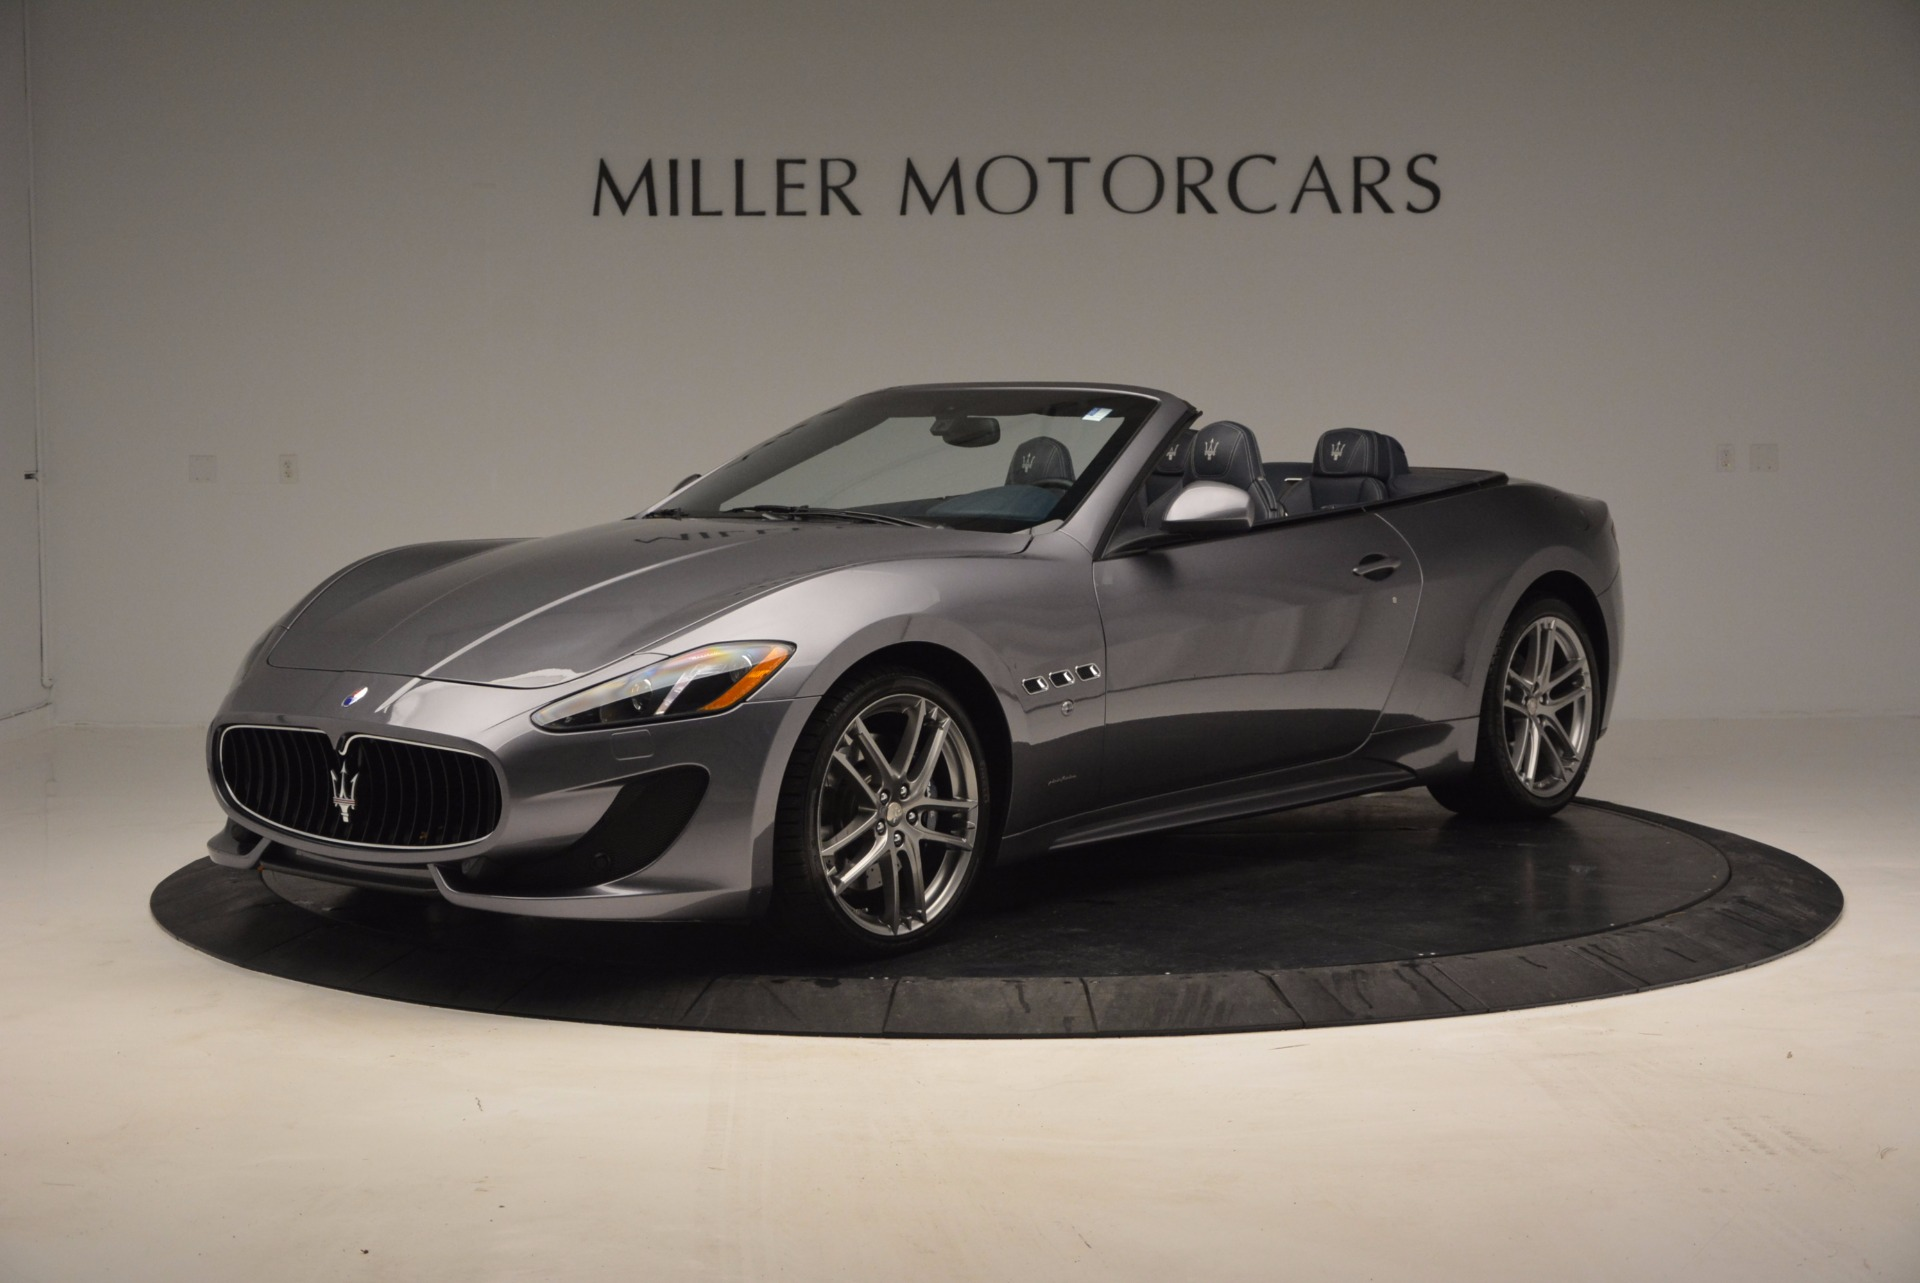 New 2017 Maserati GranTurismo Sport for sale Sold at Maserati of Westport in Westport CT 06880 1